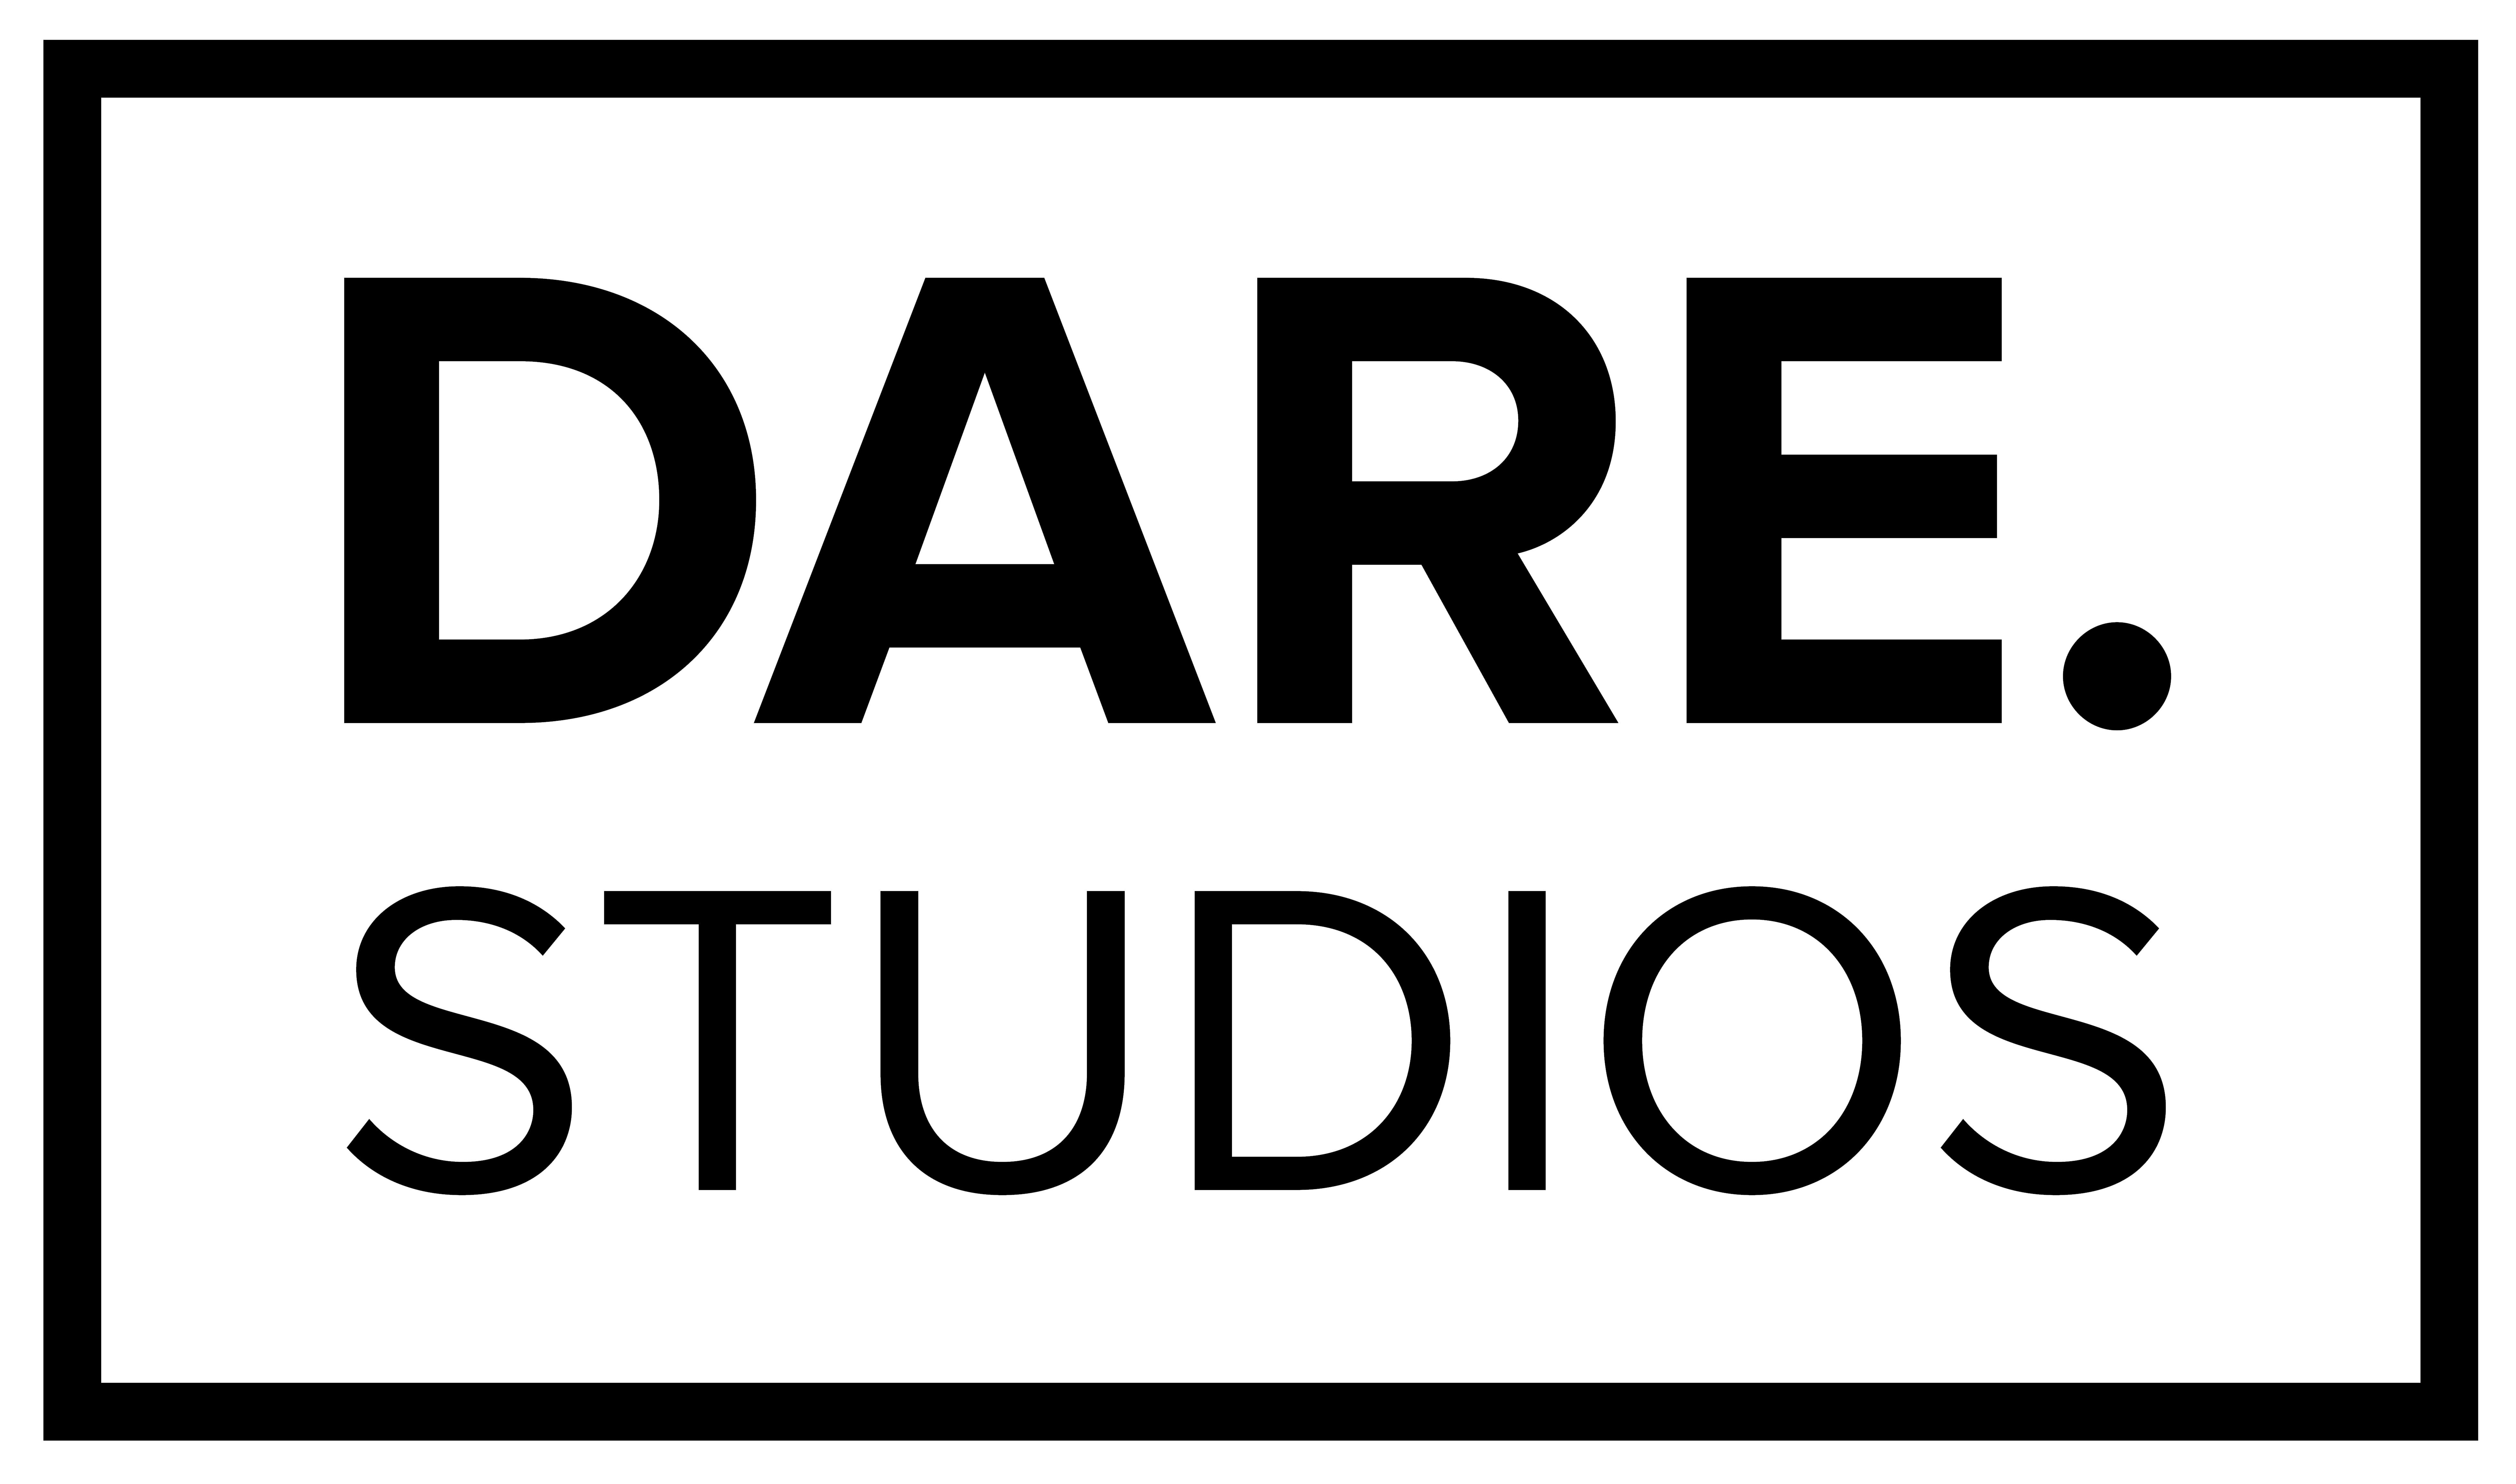 Dare Studios